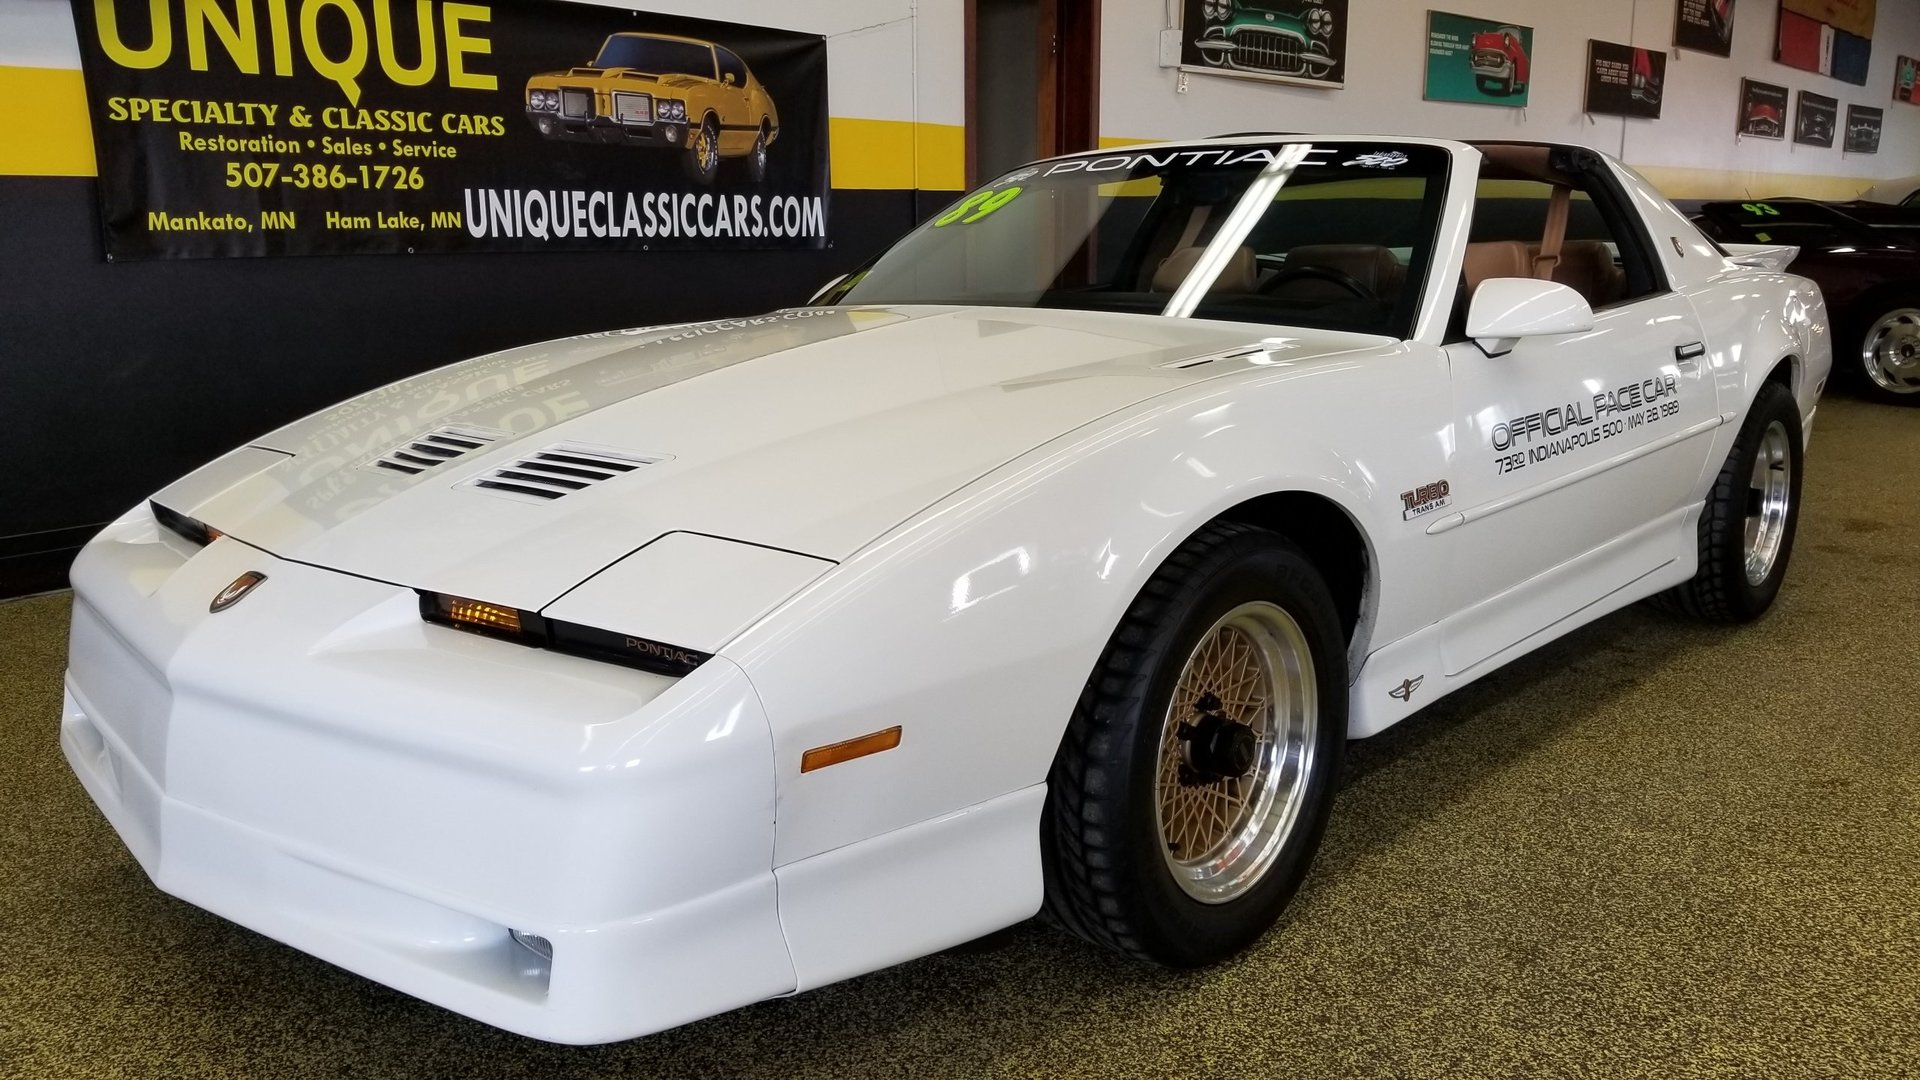 1989 Pontiac Firebird Turbo Trans Am Indy Pace Car for sale #81470   MCG